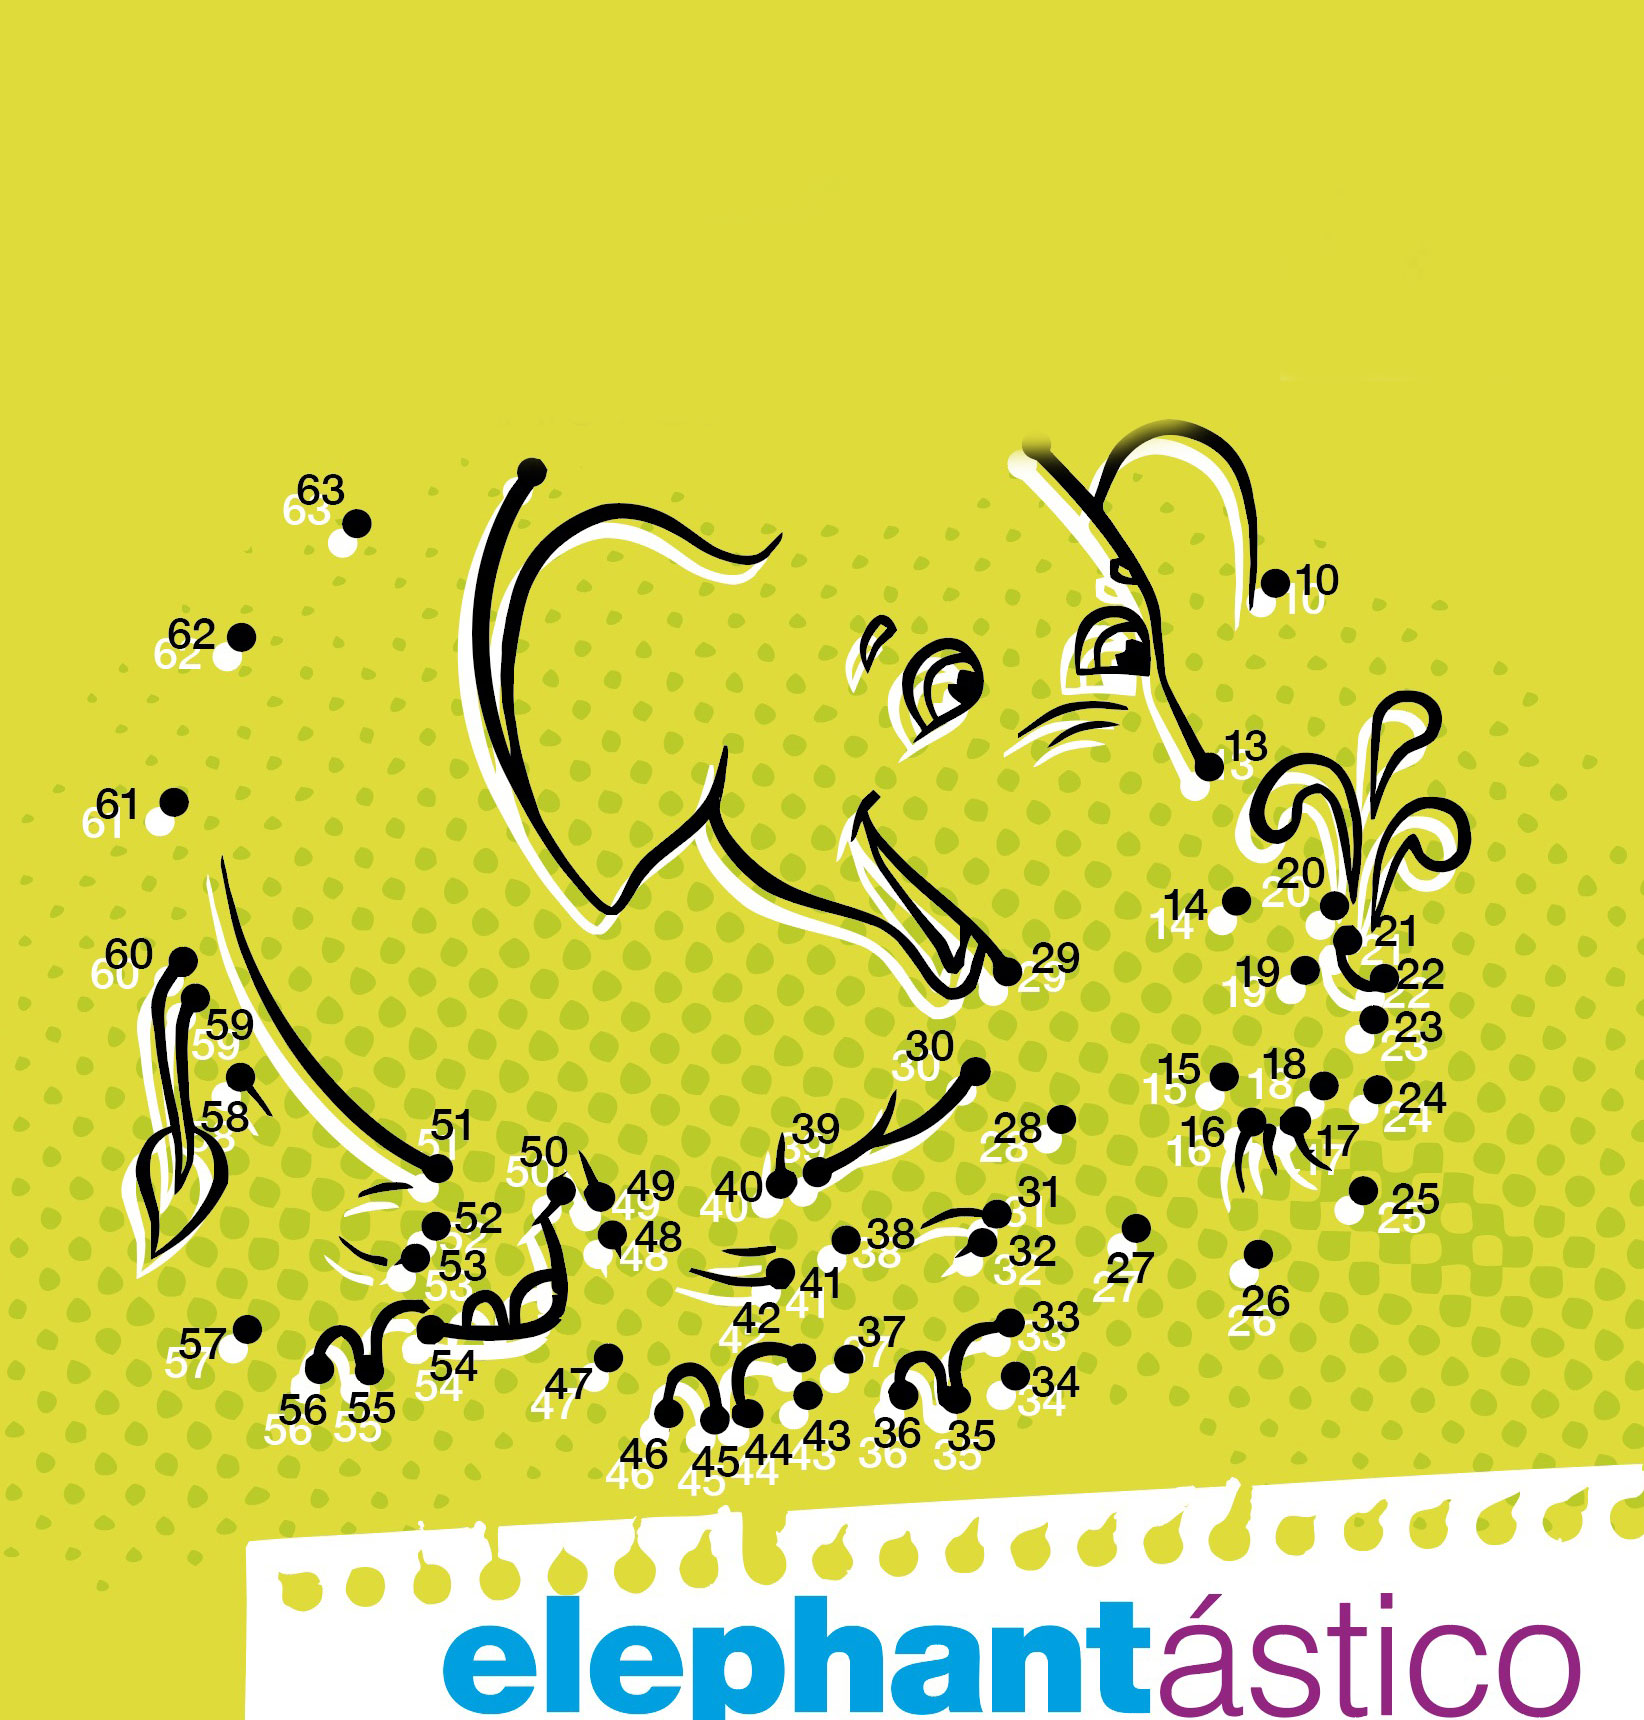 5o Ευρωπαϊκό Παιδικό Φεστιβάλ ELEPHANTASTICO